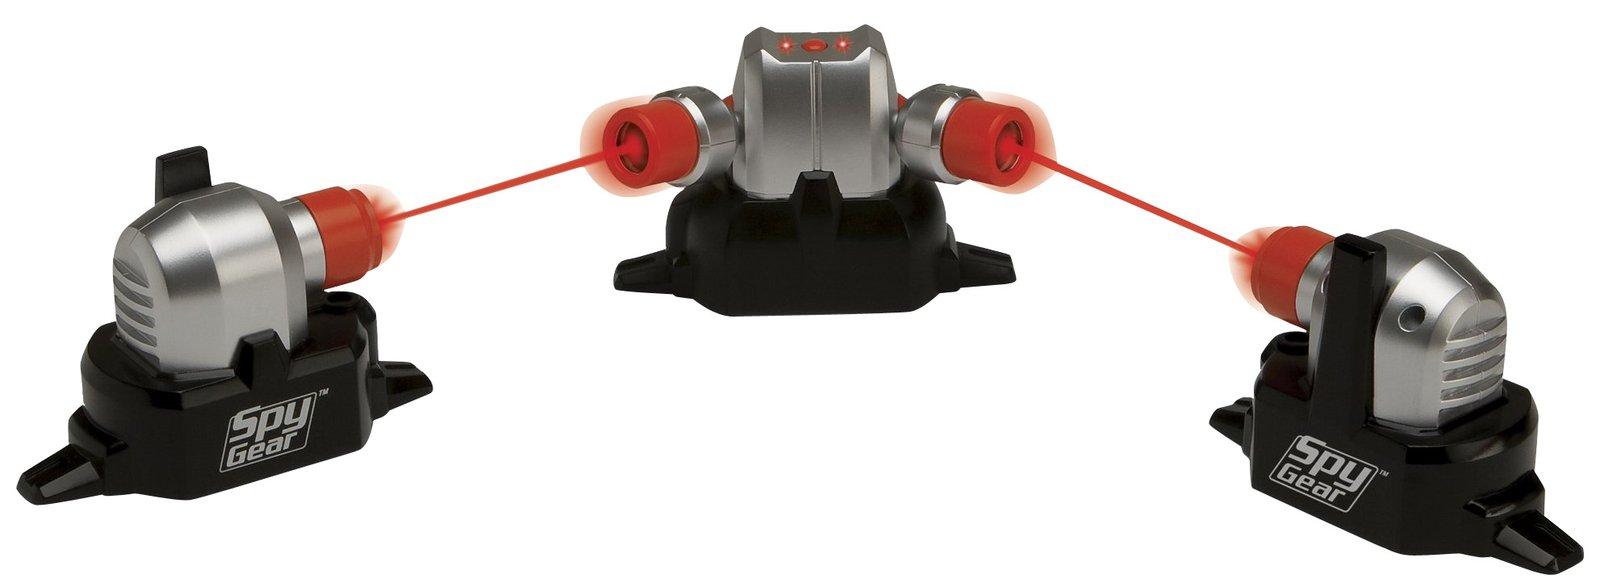 Cool Spy Toys : Spy gear laser tripwire that should be mine